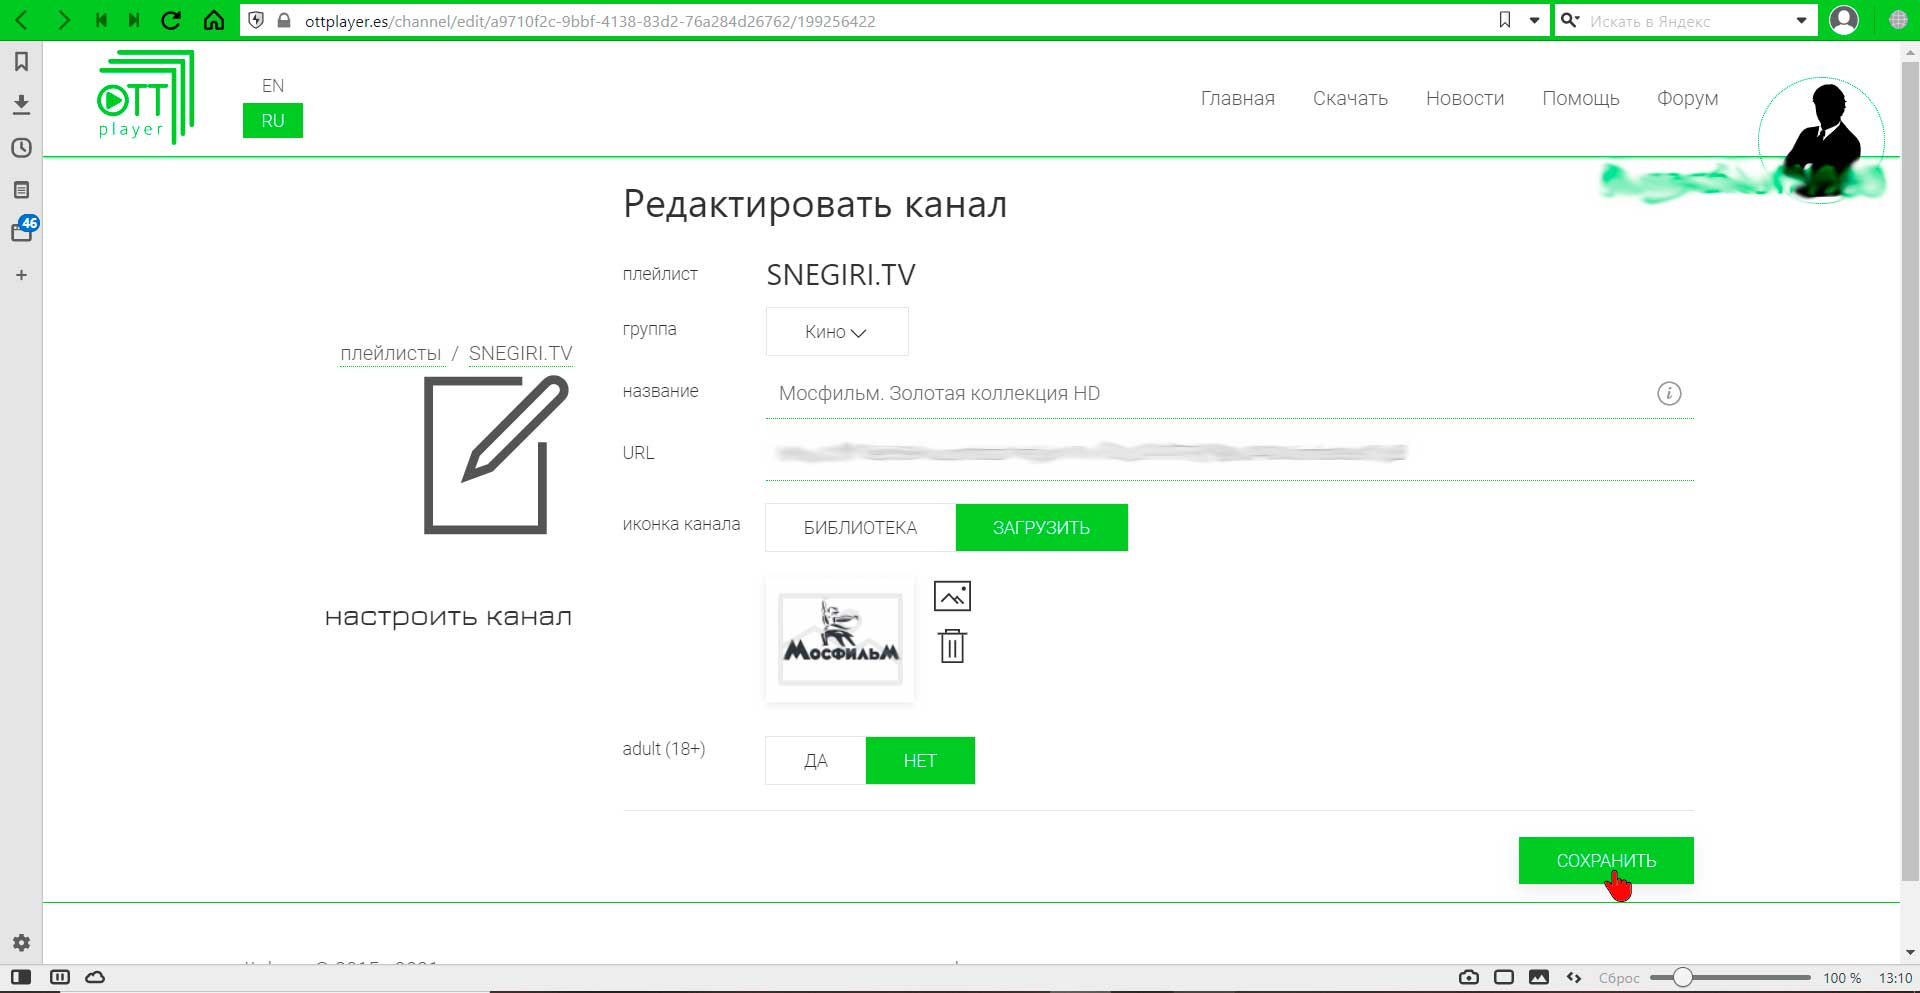 Приложение OttPlayer